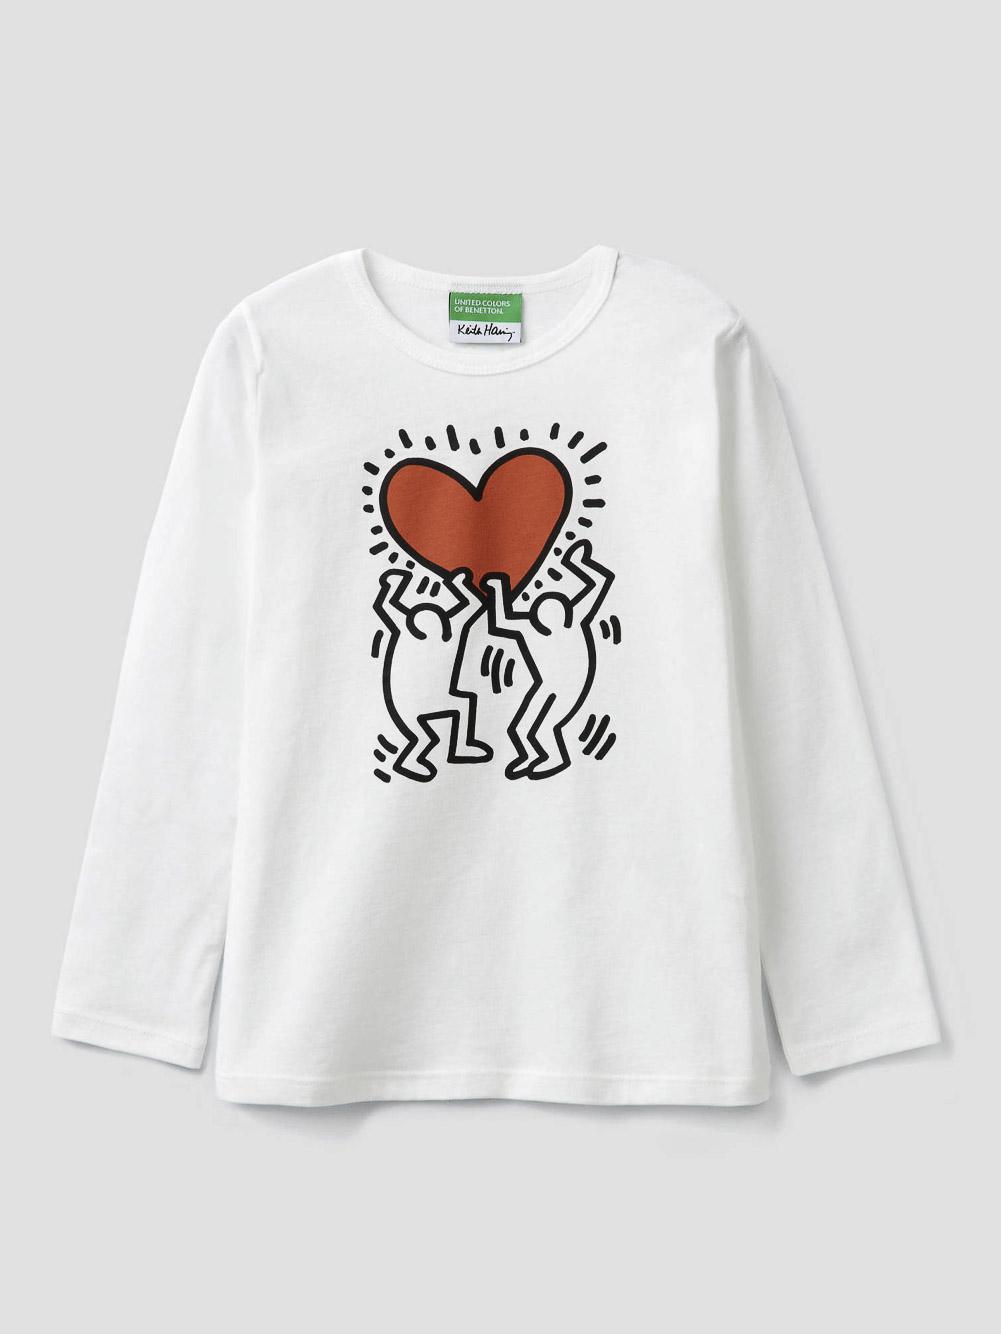 012 BENETTON T-shirt μακρυμάνικο Keit Haring 3096C14TS 20A074